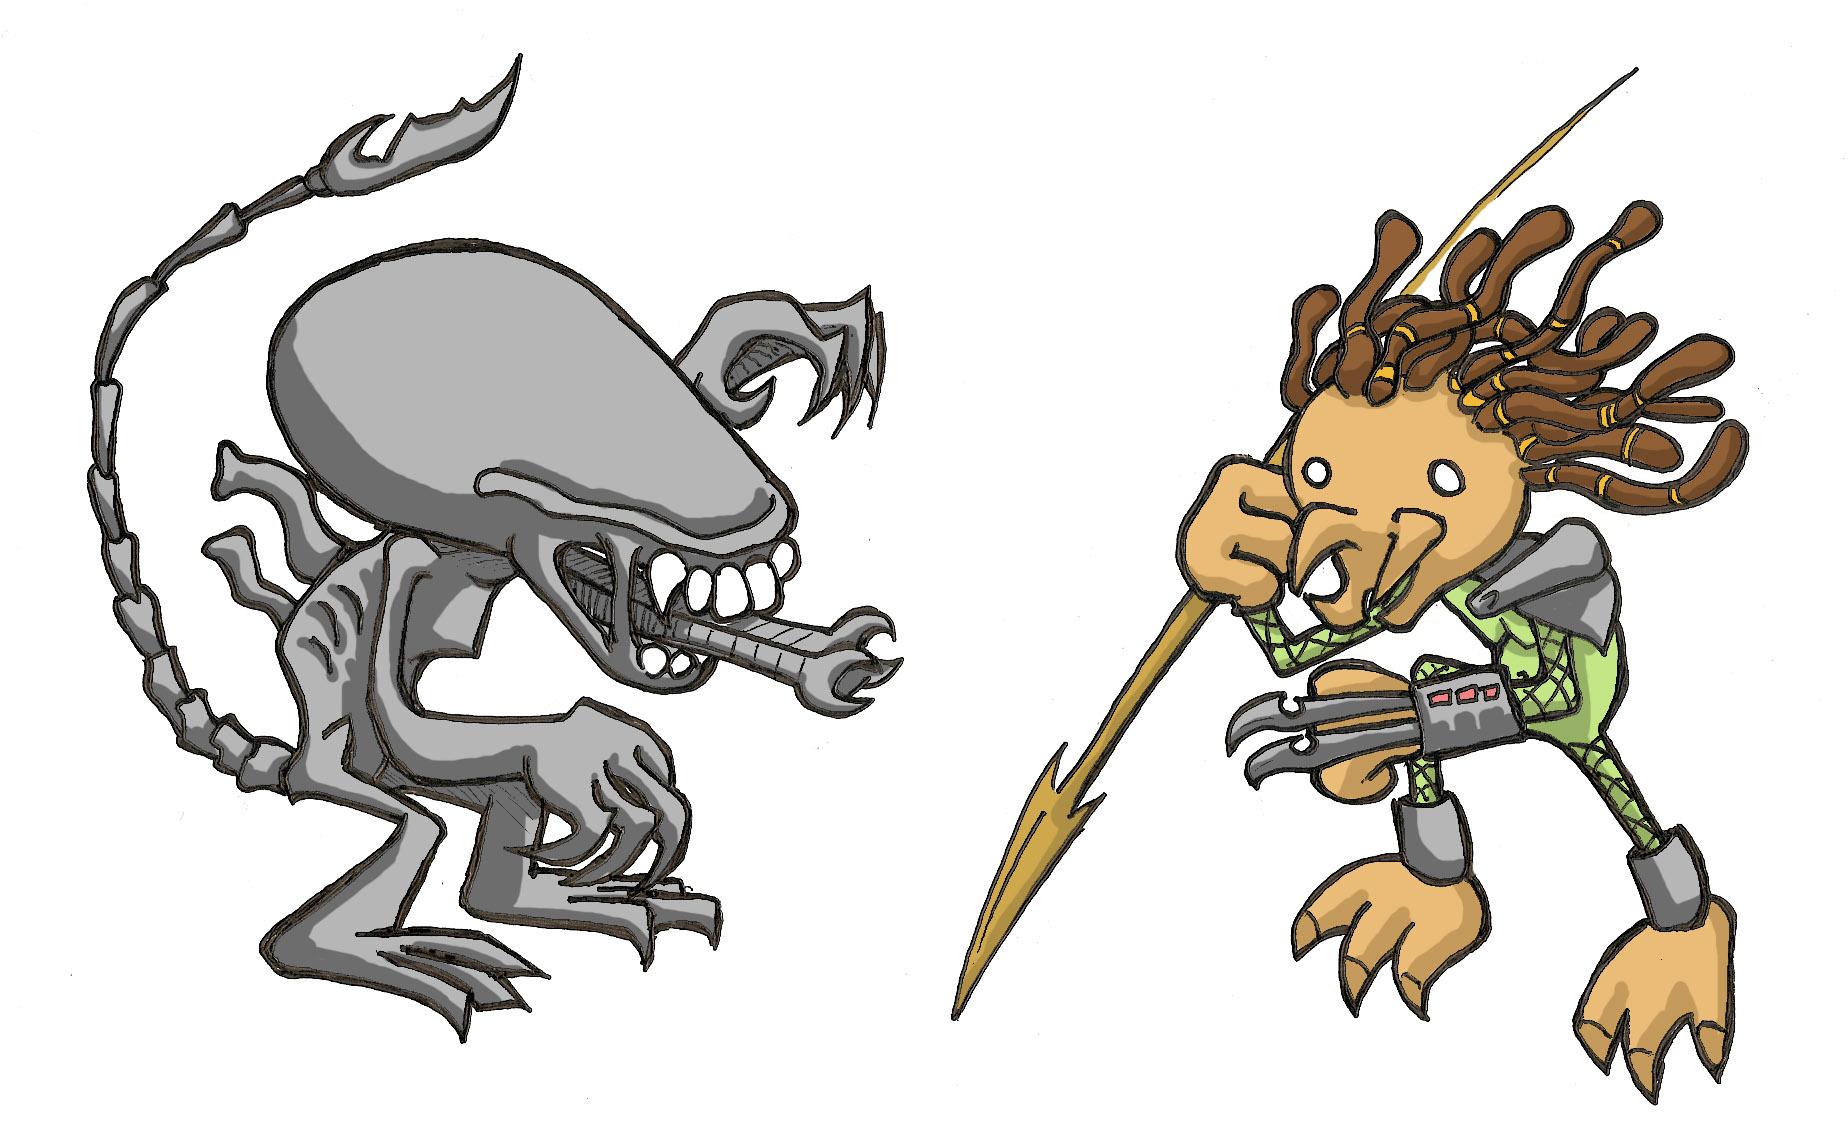 Alien vs. Predator: The Musical | the amnesia-naut